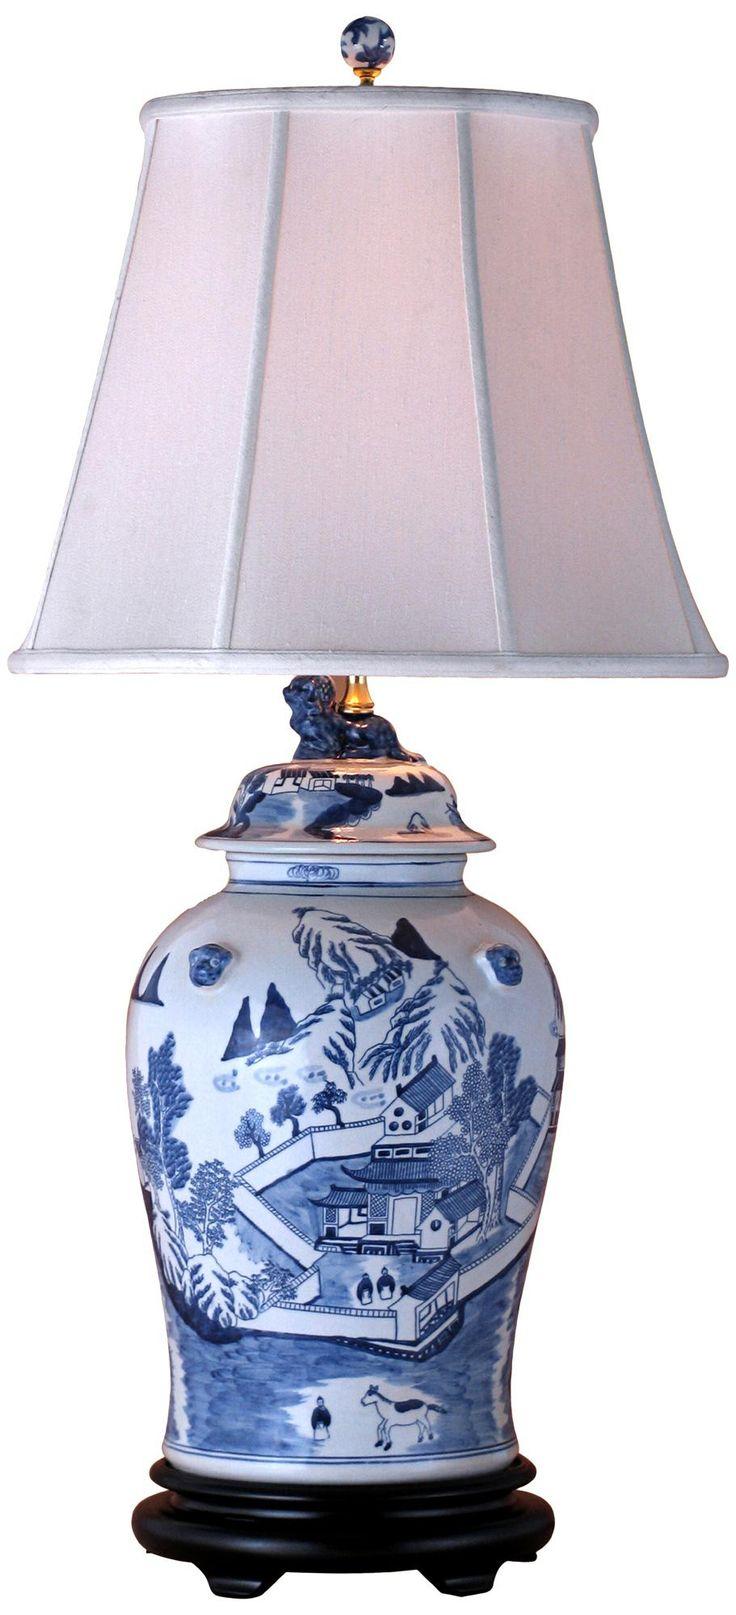 canton blue and white temple jar porcelain table lamp. Black Bedroom Furniture Sets. Home Design Ideas